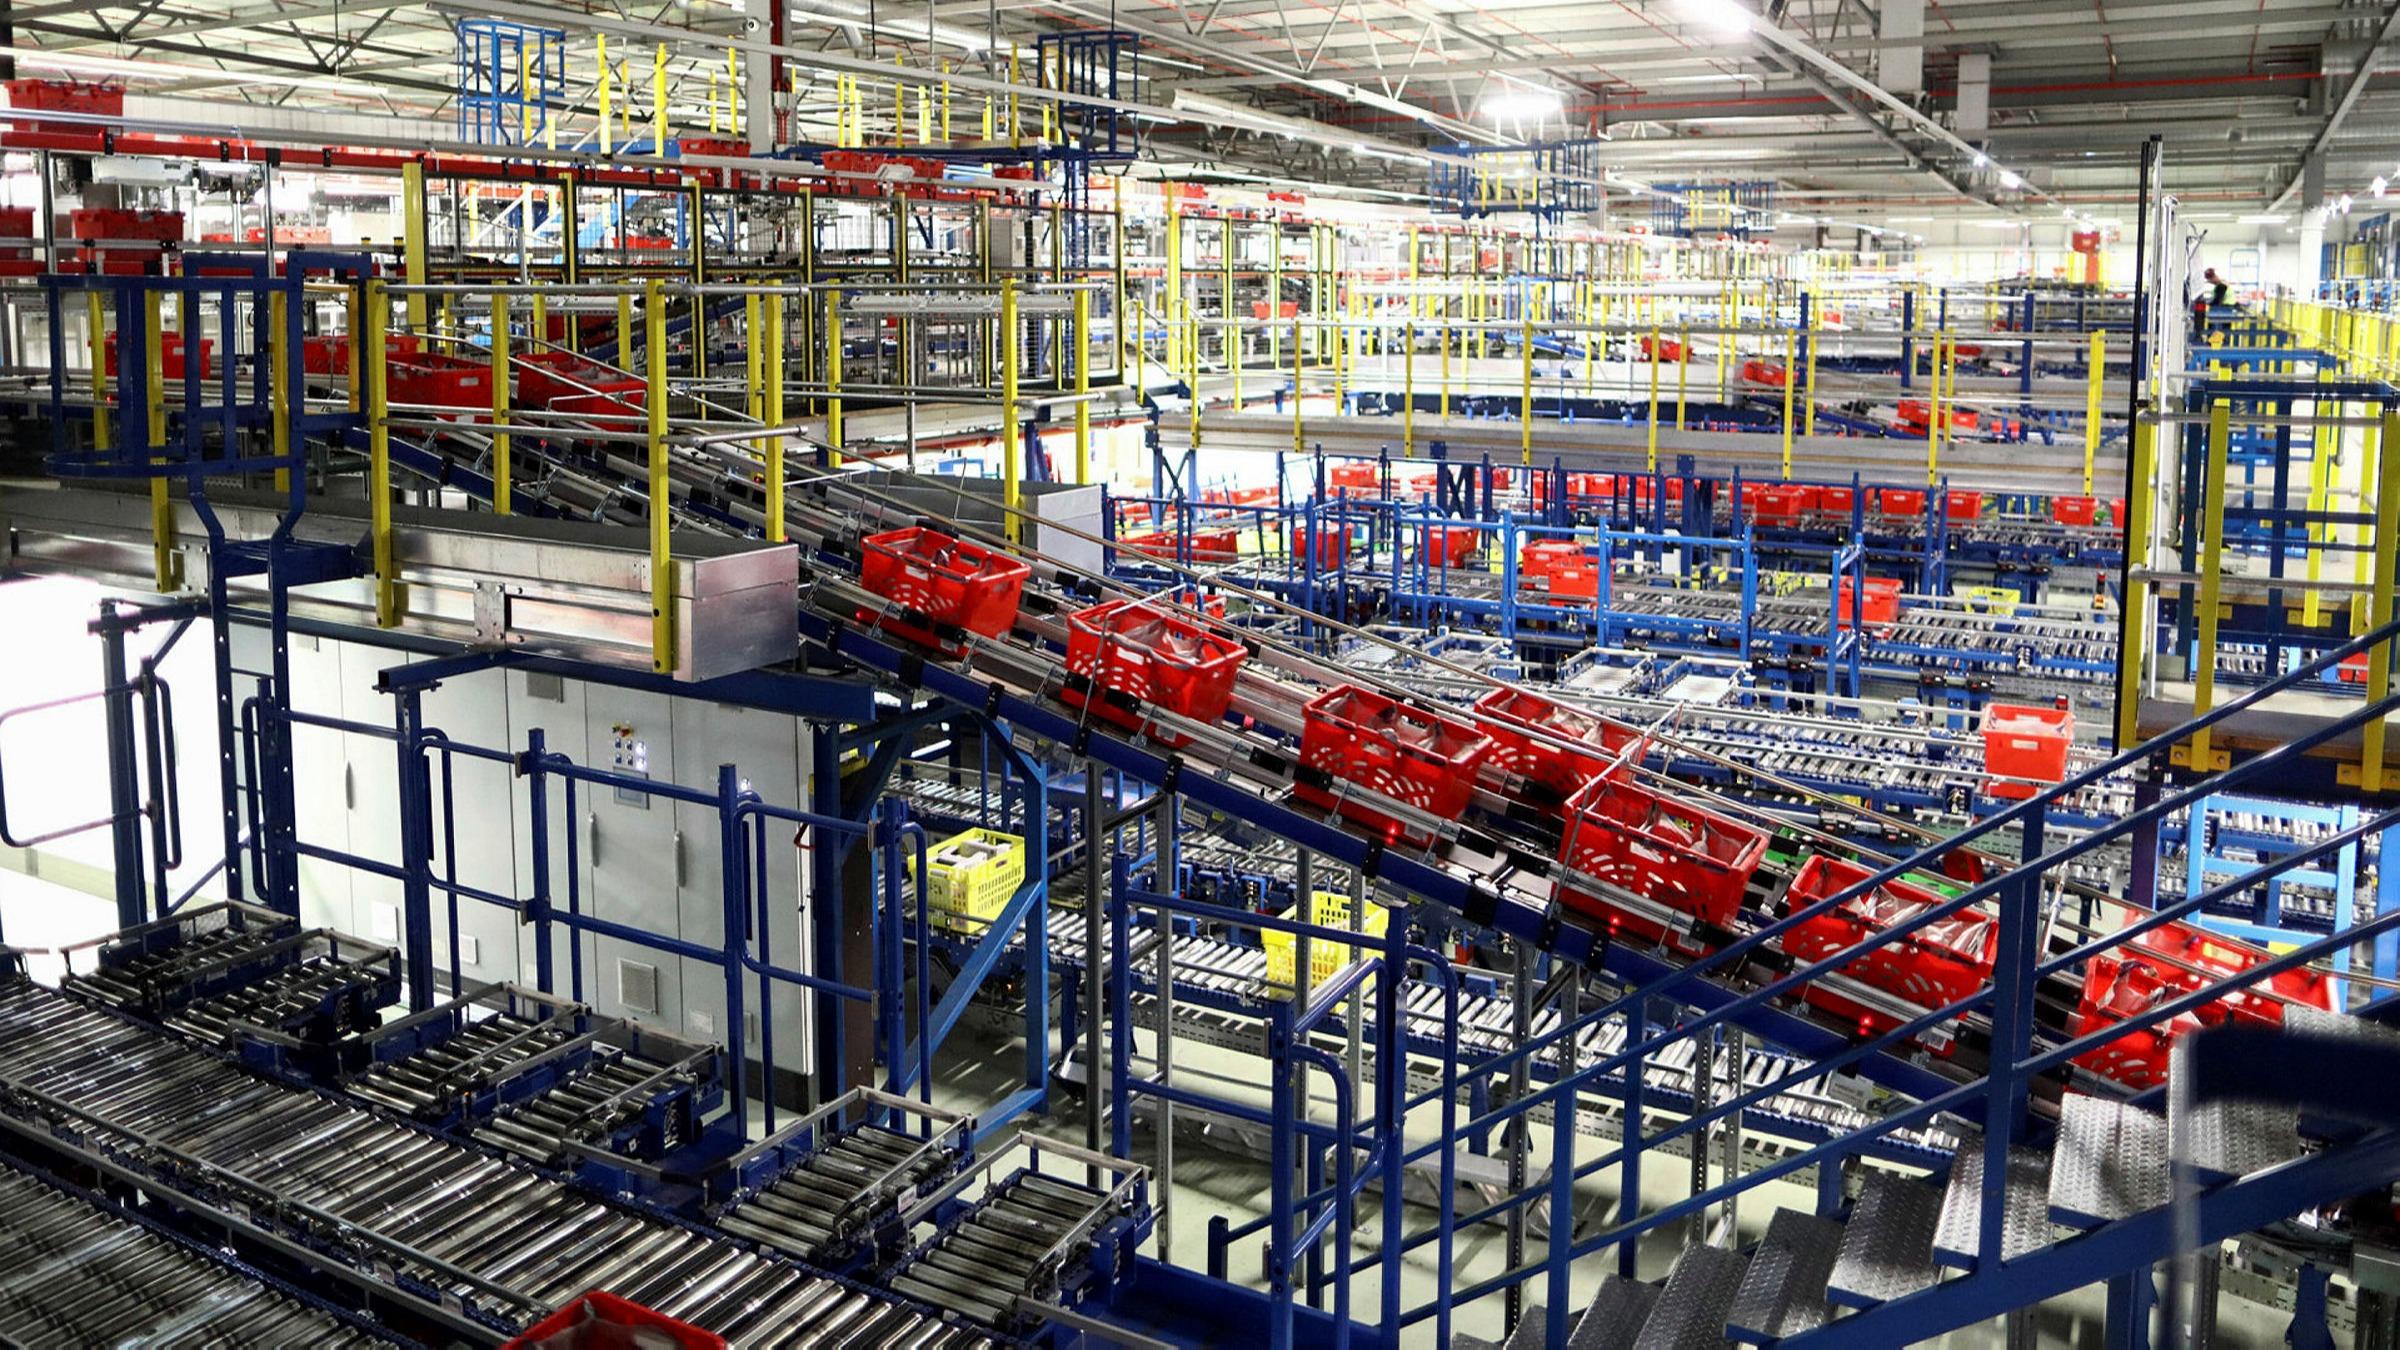 Segro/industrial property: delivery hero